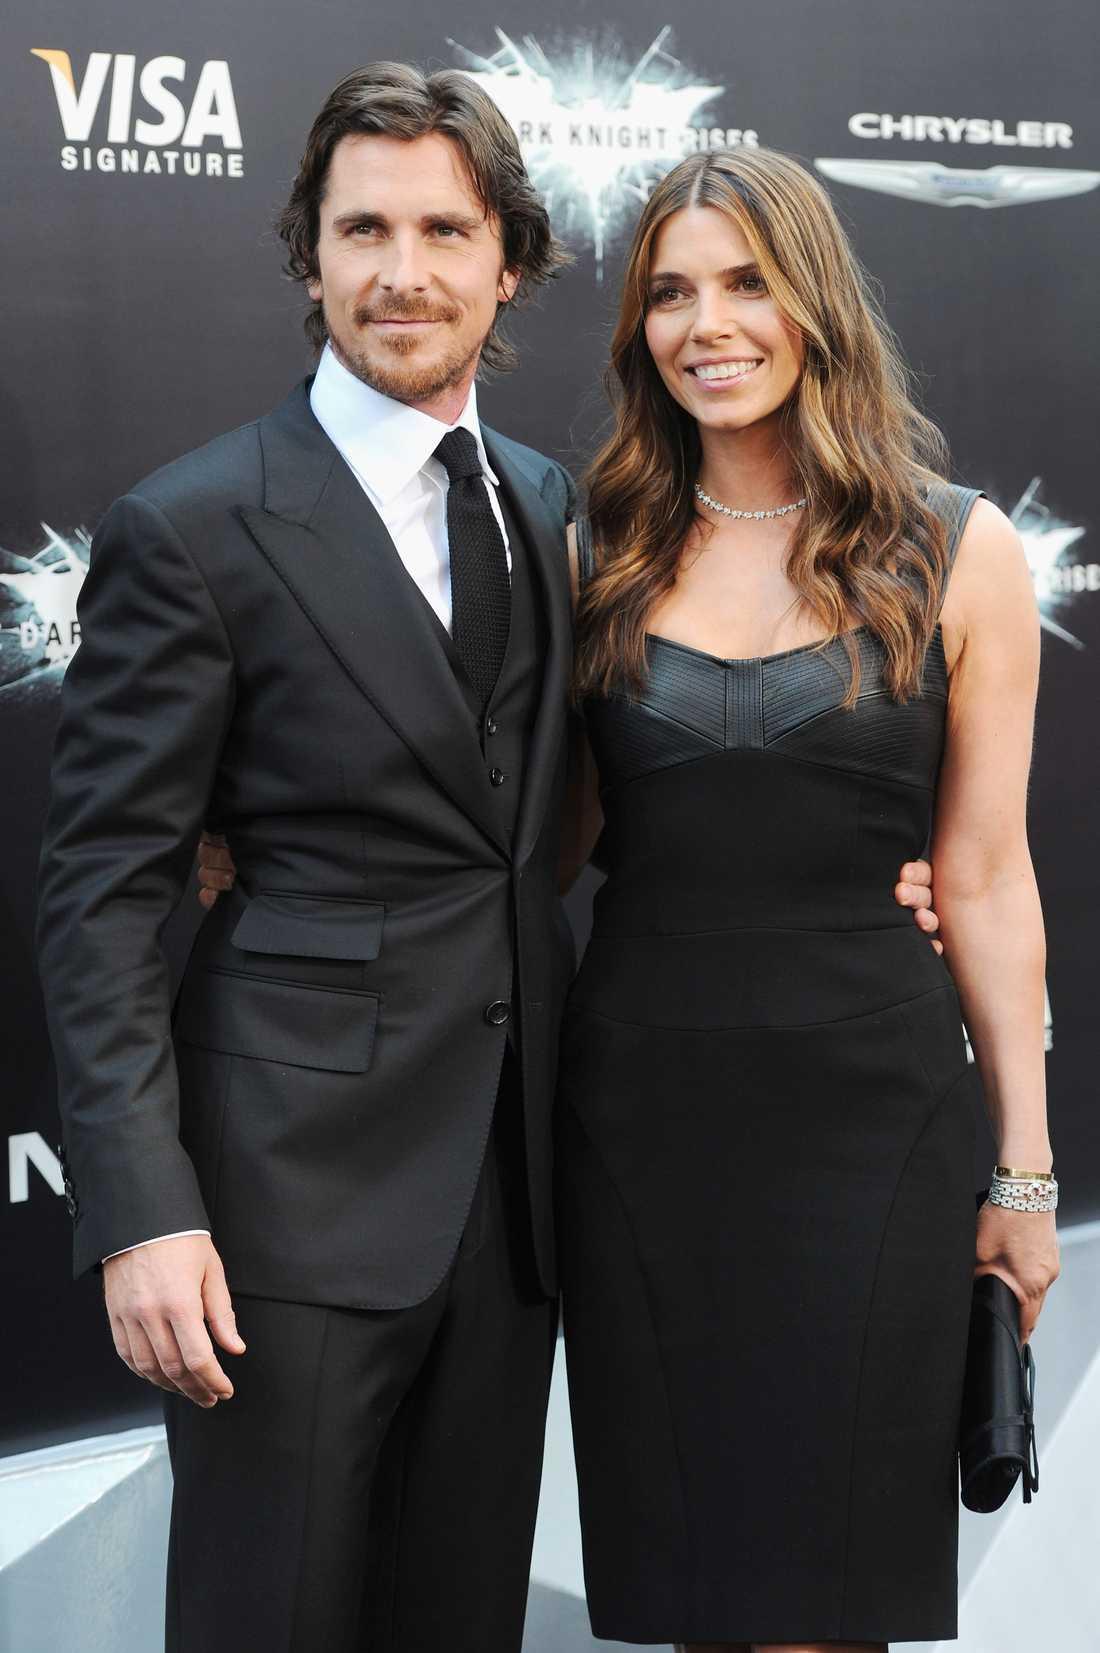 Christian Bale med hustrun Sibi Blazic.